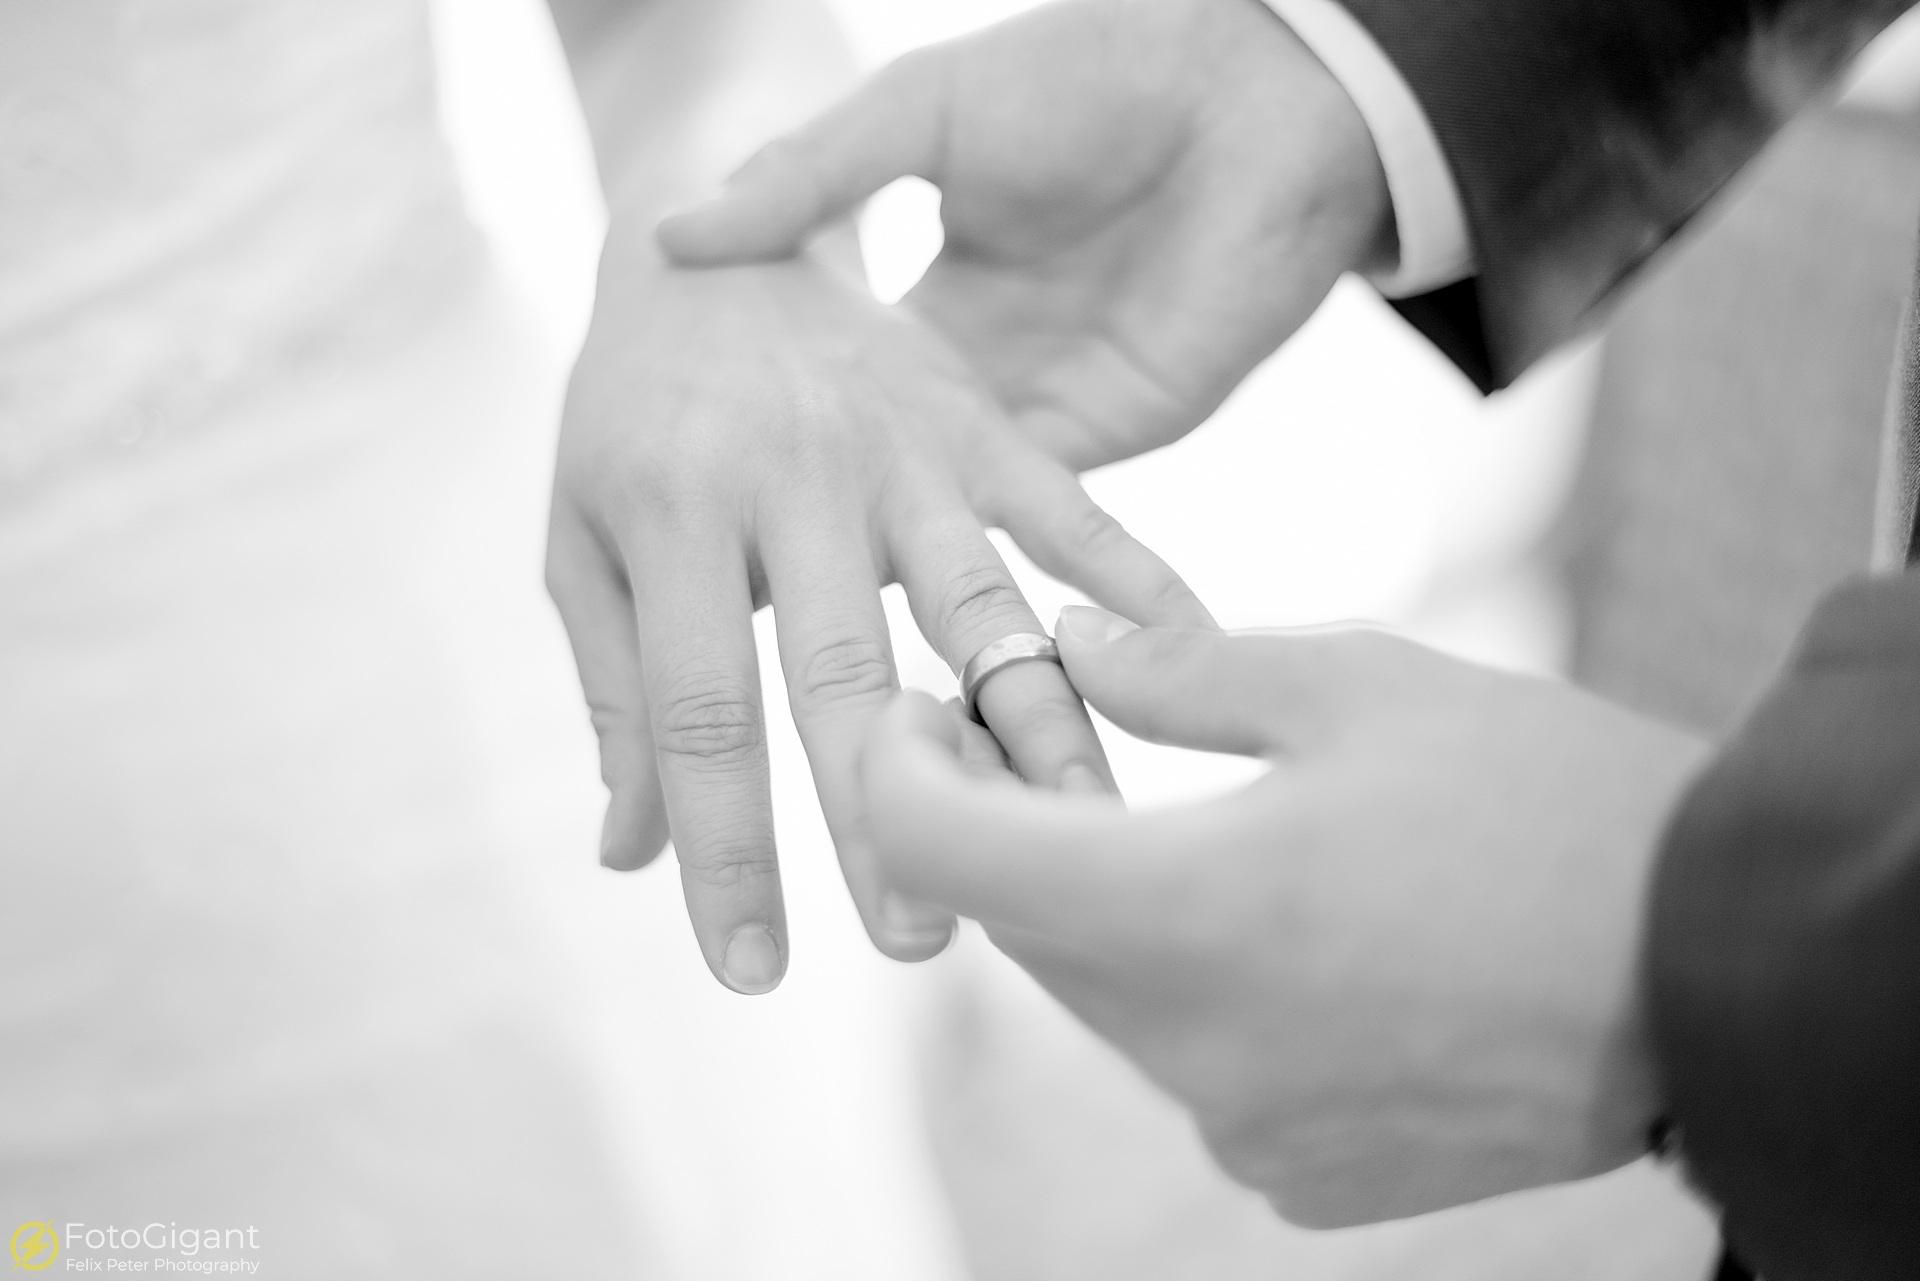 Hochzeitsfotografiekurs_Fotograf_Felix_Peter_33.jpg